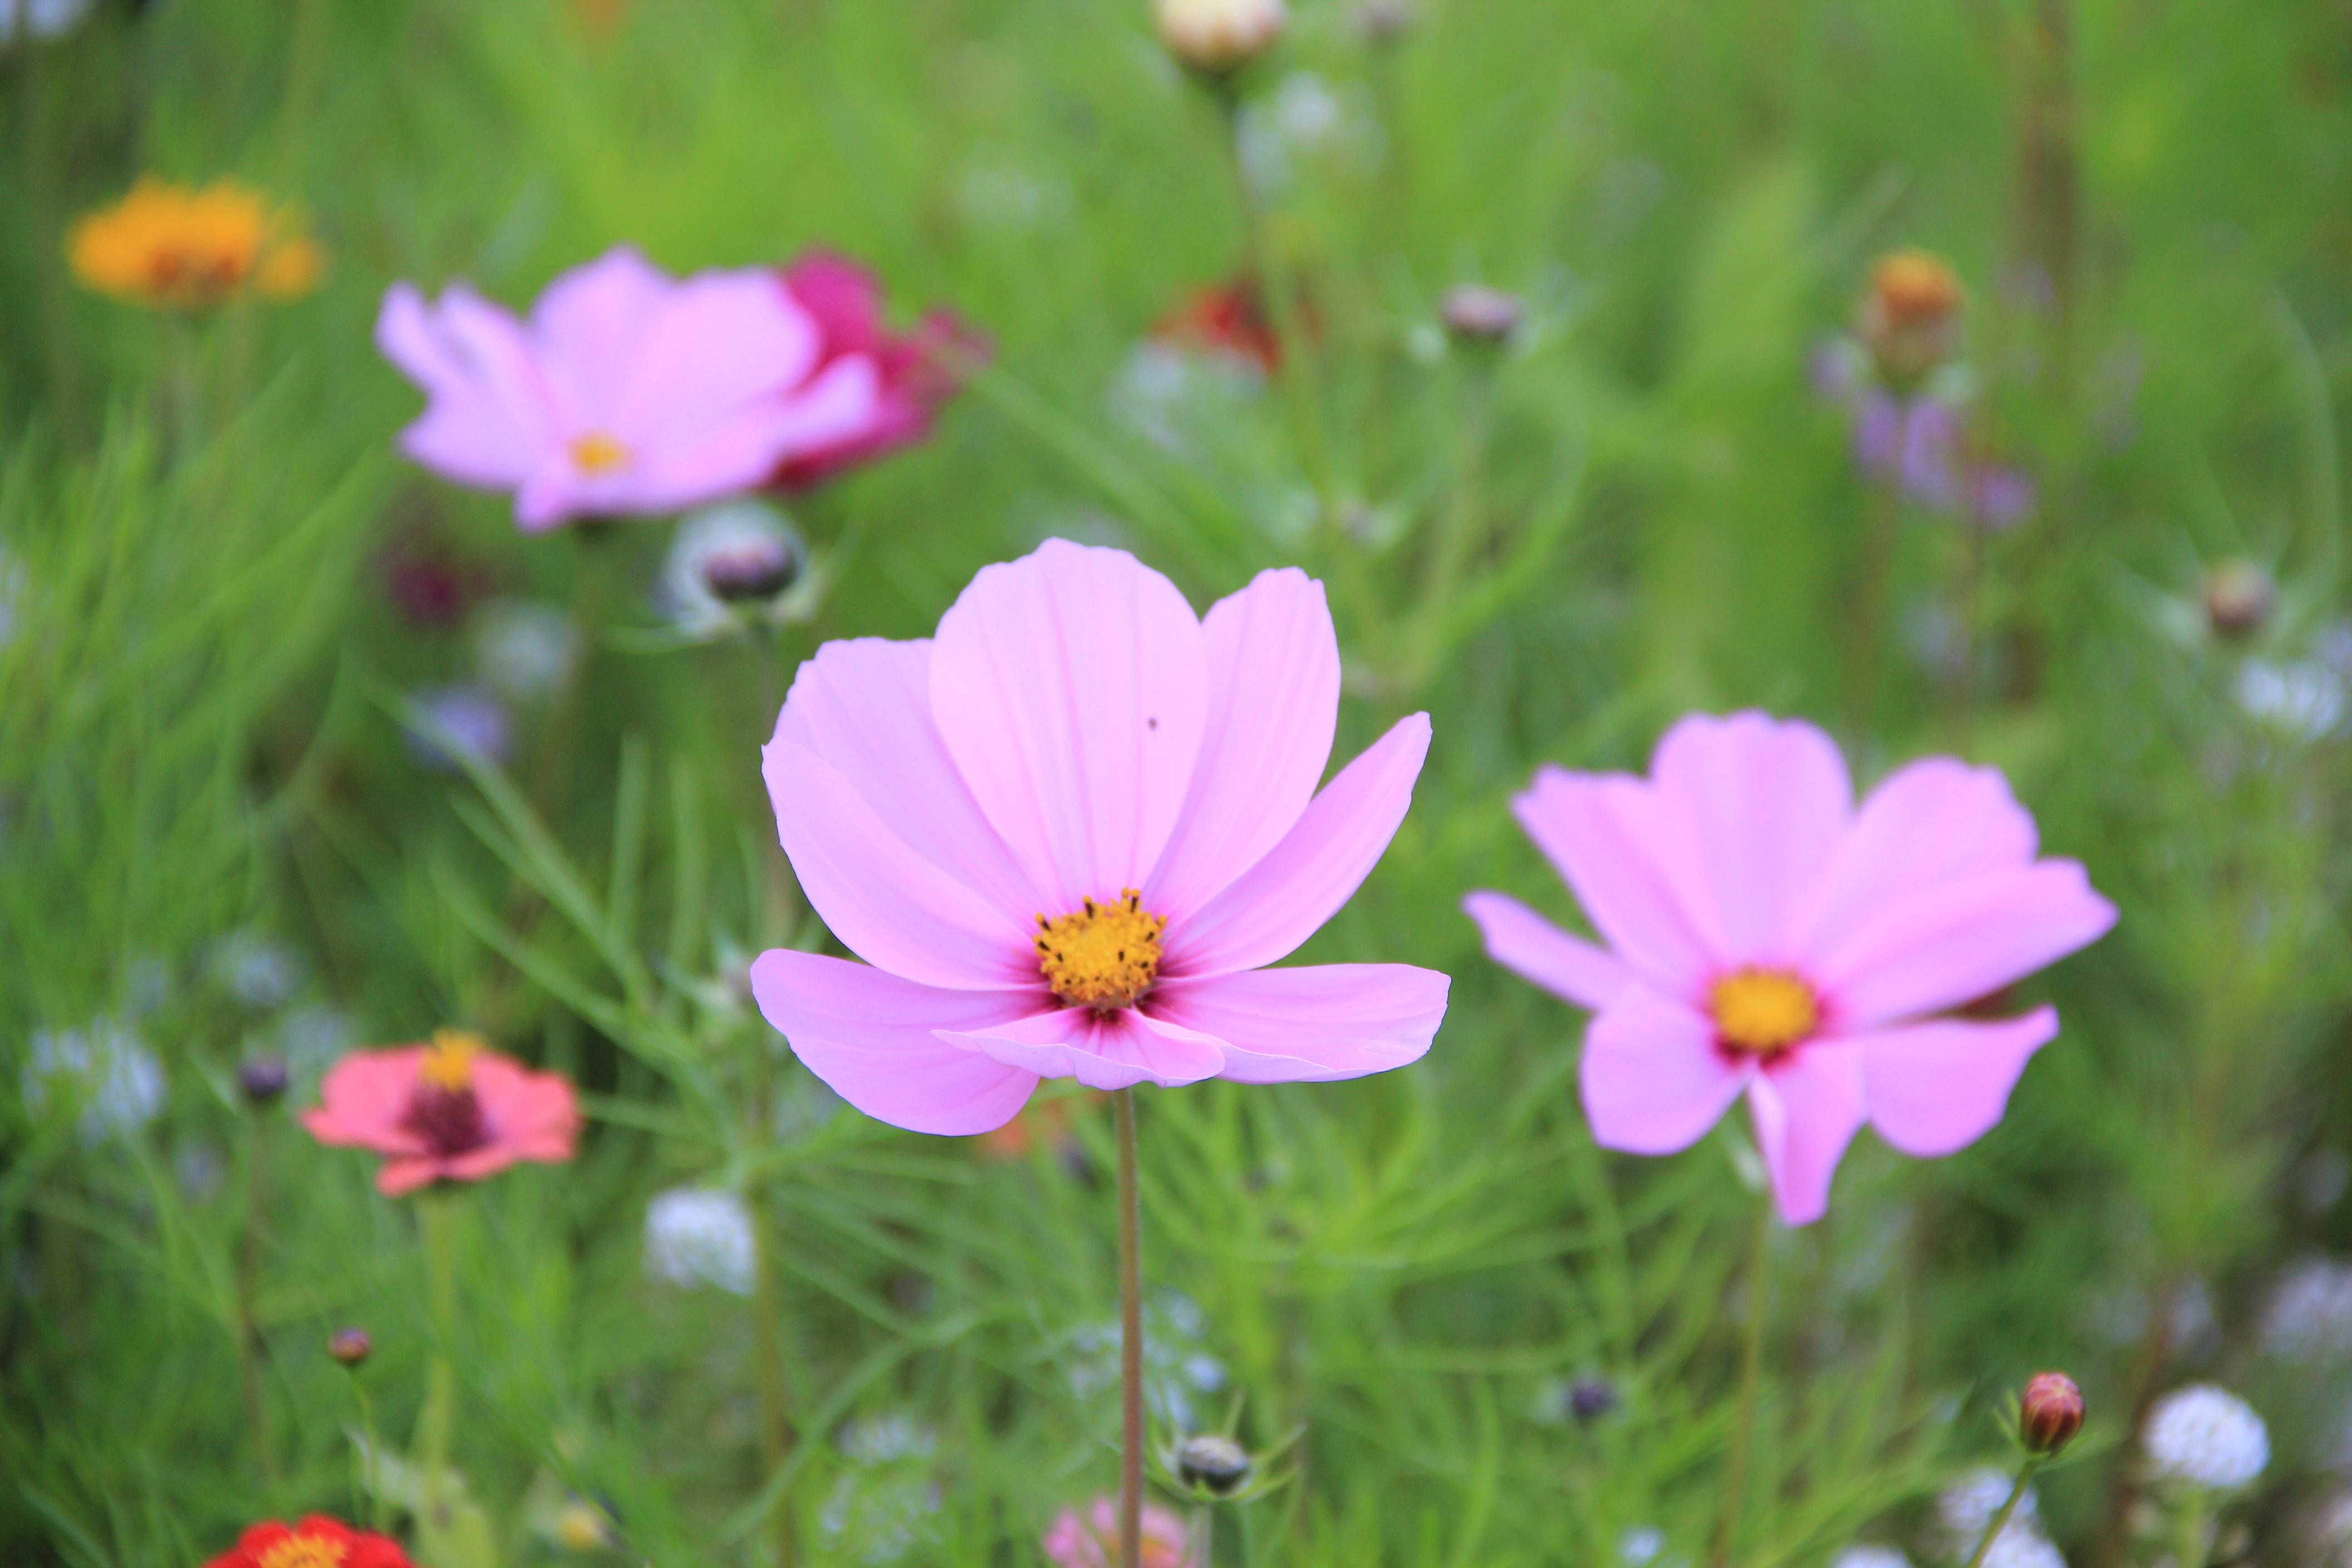 Free Images Nature Grass Blossom Field Petal Bloom Summer